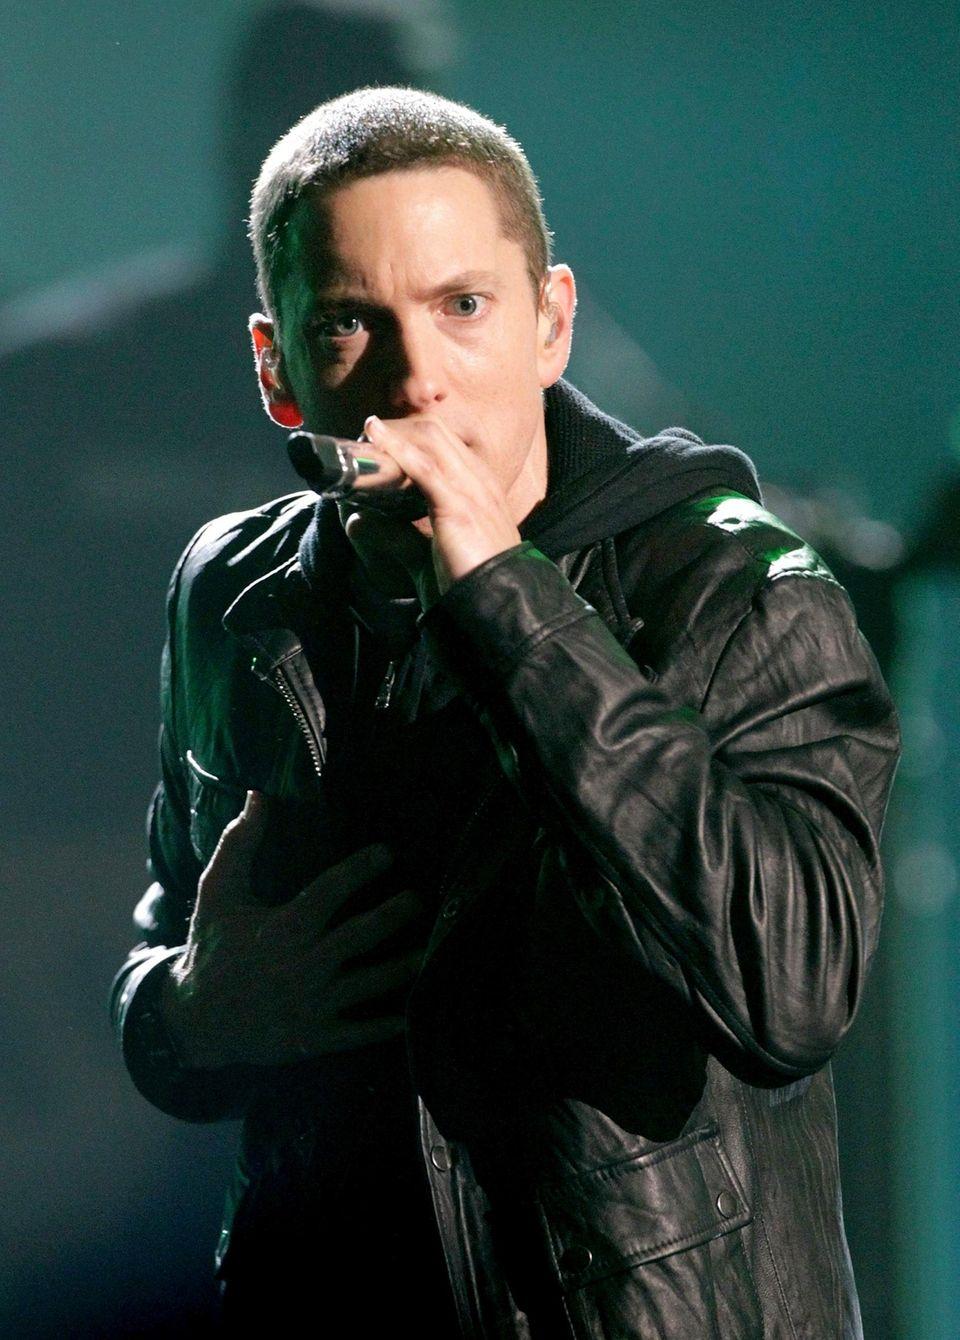 Eminem was born on Oct. 17, 1972.